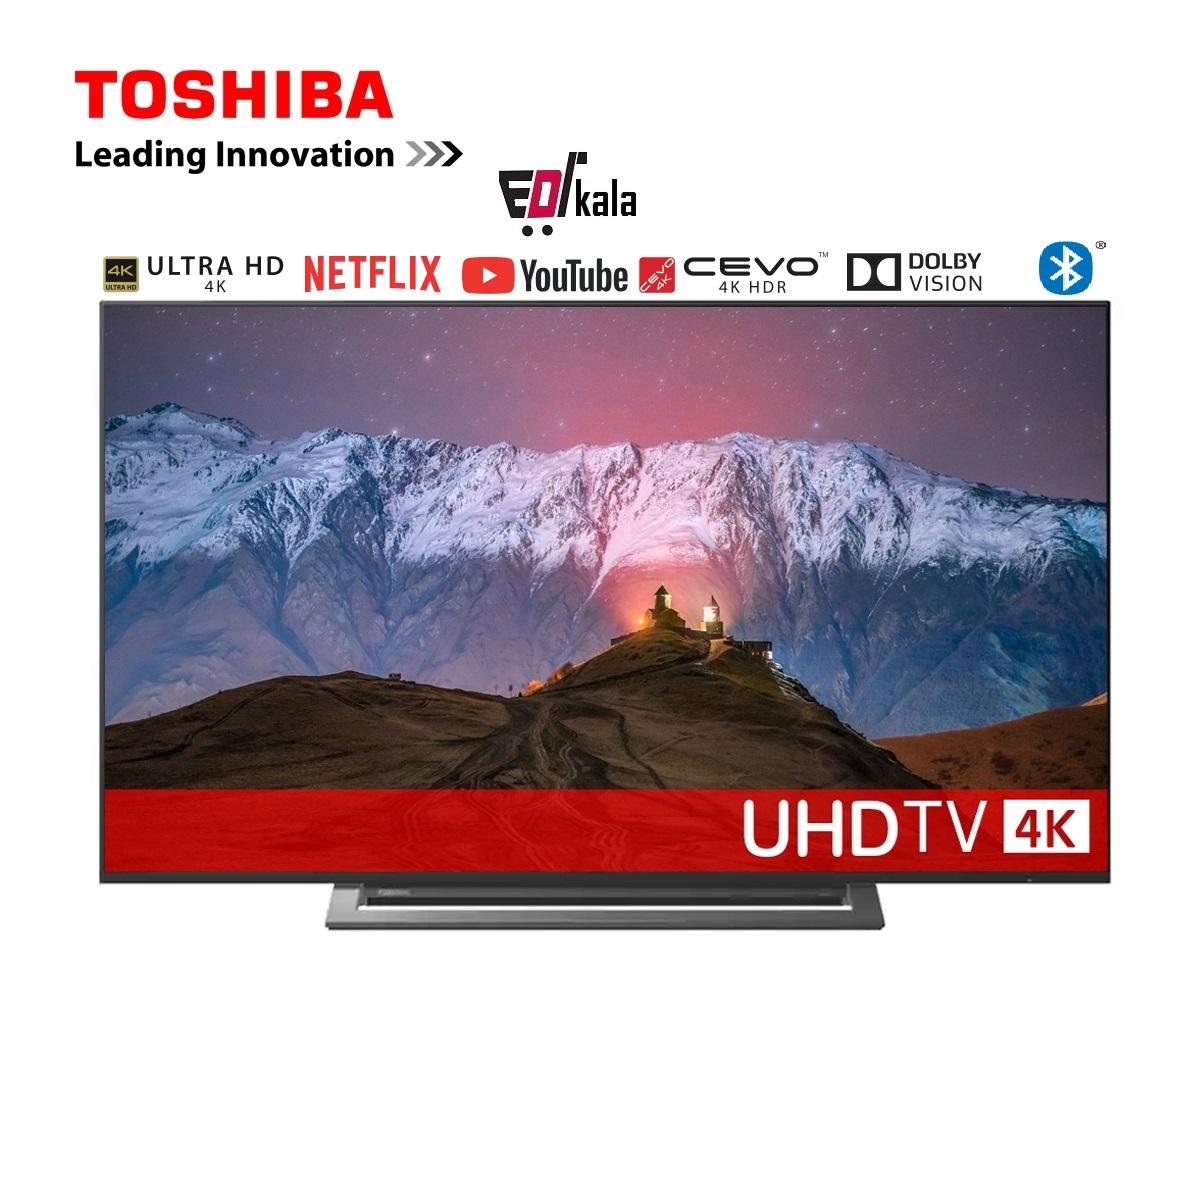 تلویزیون اولترا اچ دی توشیبا 55 اینچ مدل U7950